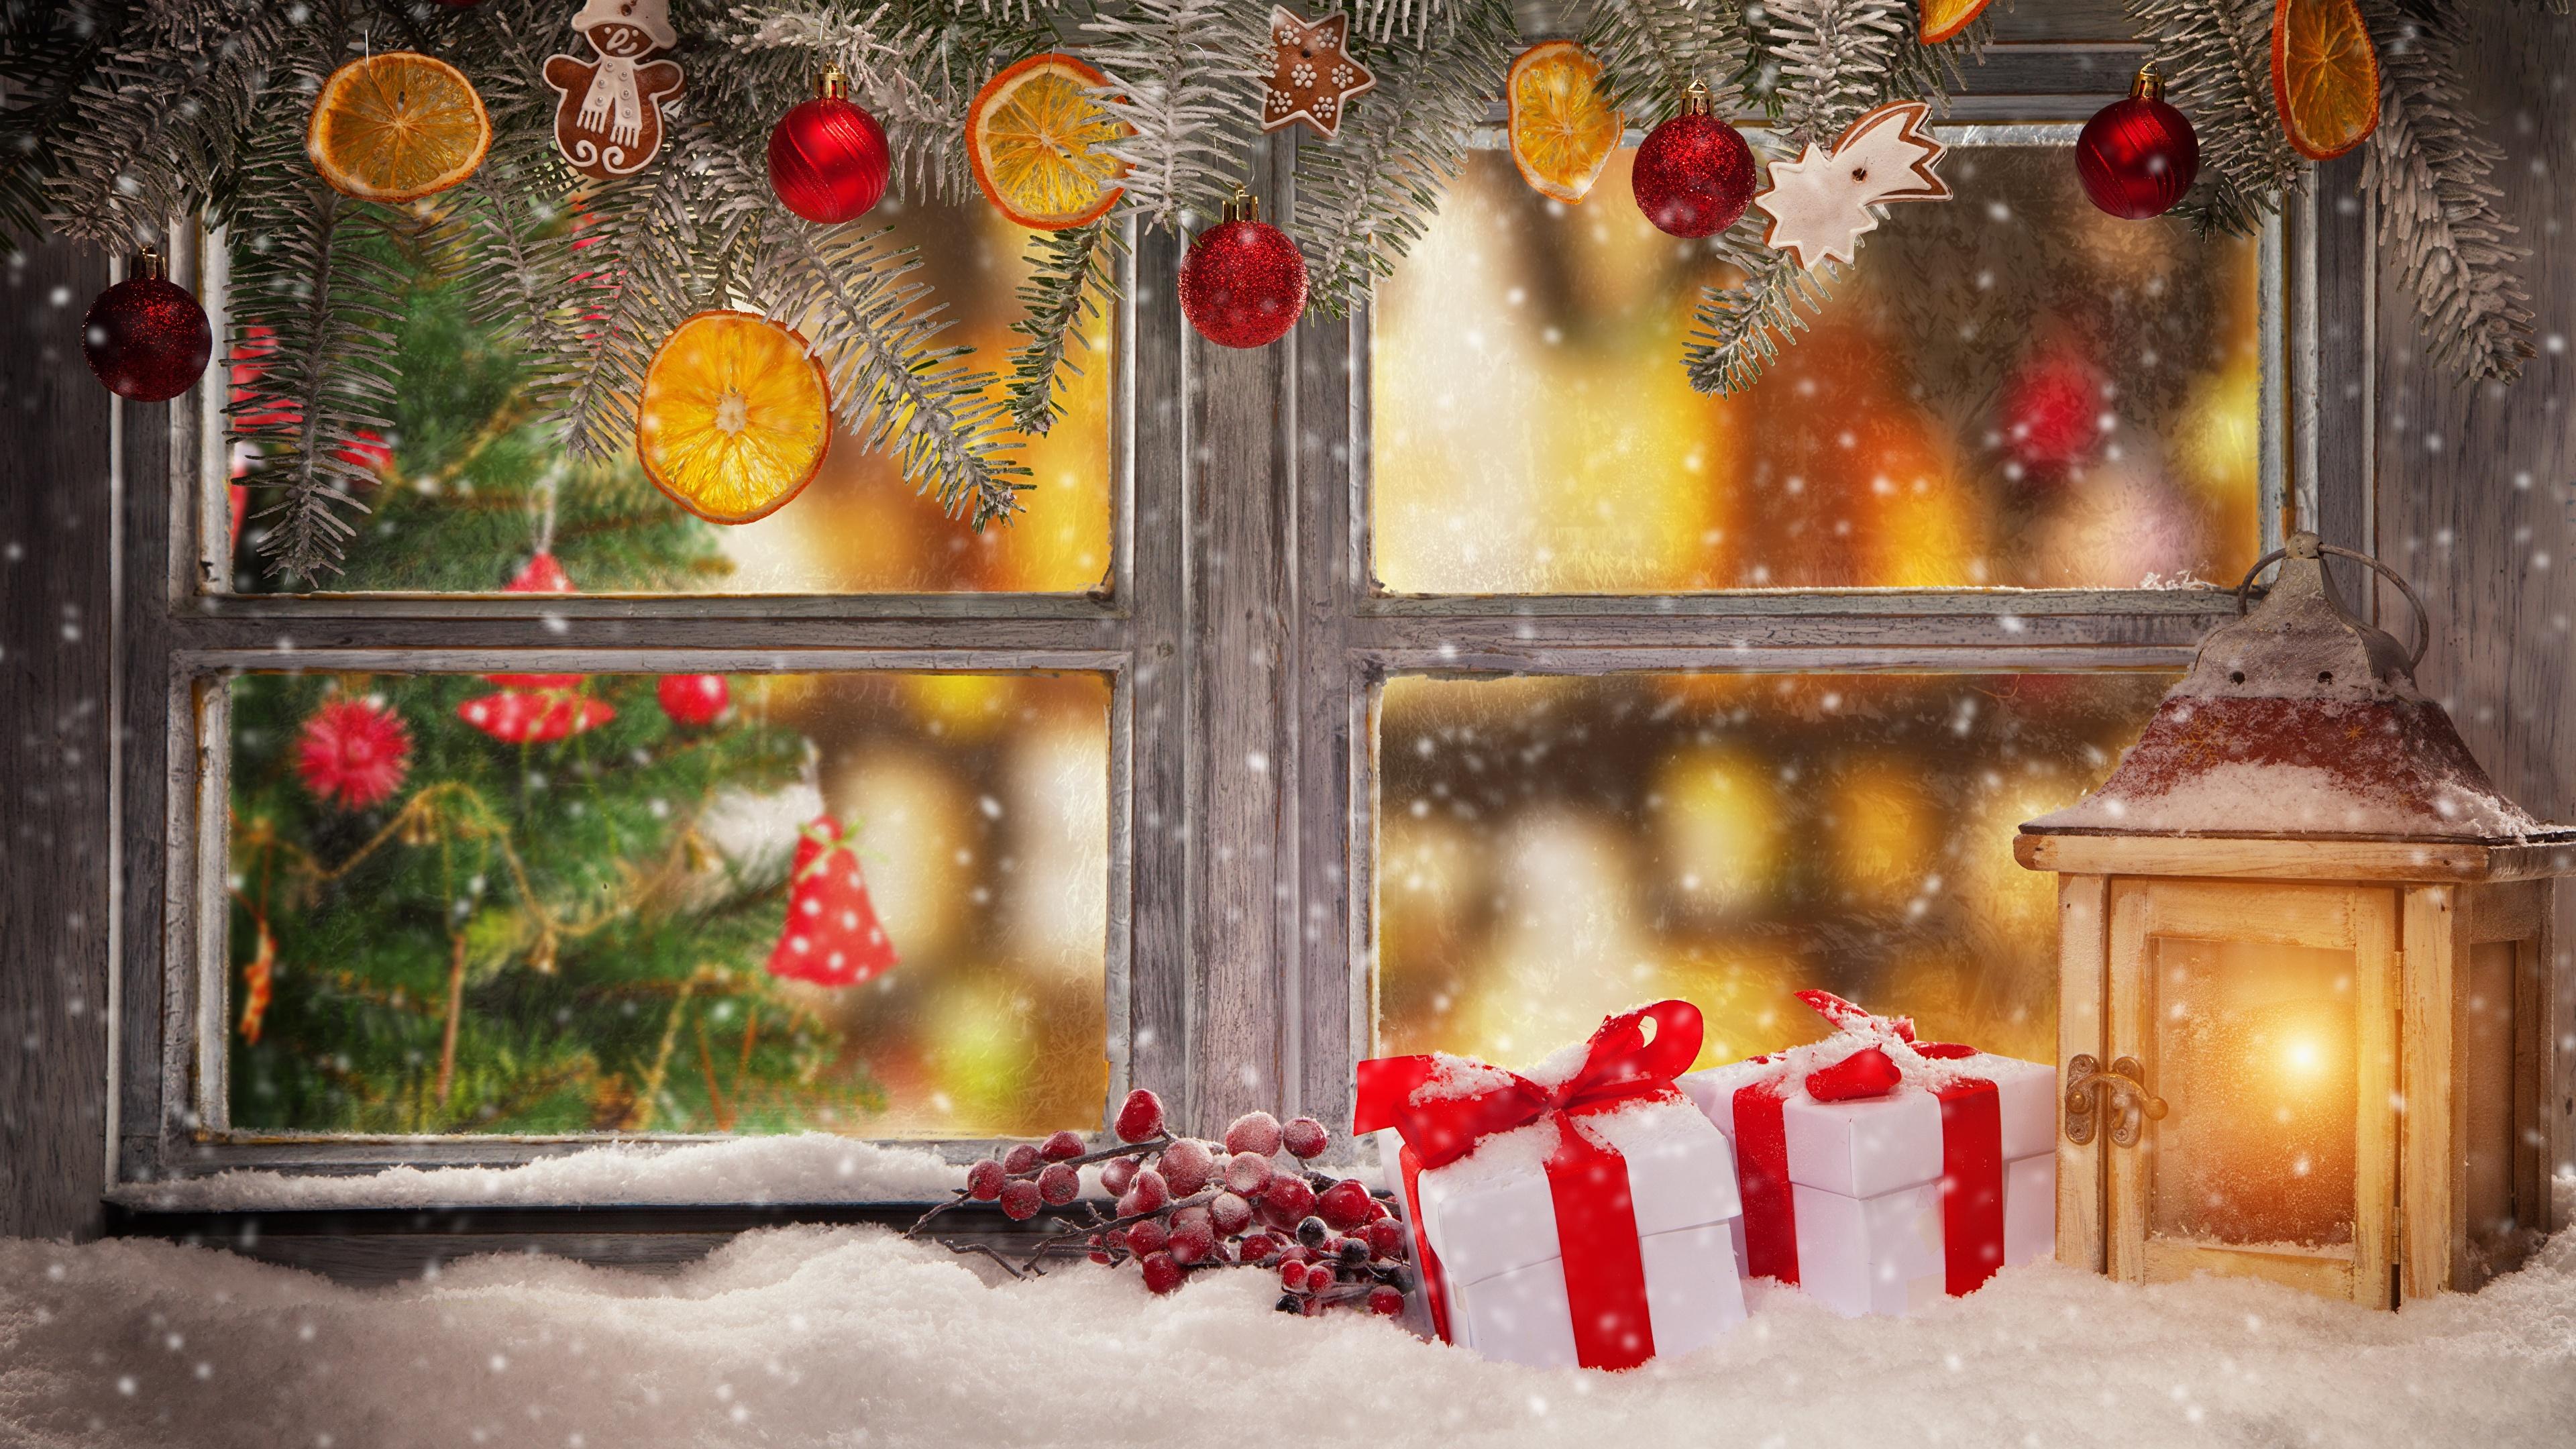 Сапоги новый год окно Boots new year window  № 2639443 без смс